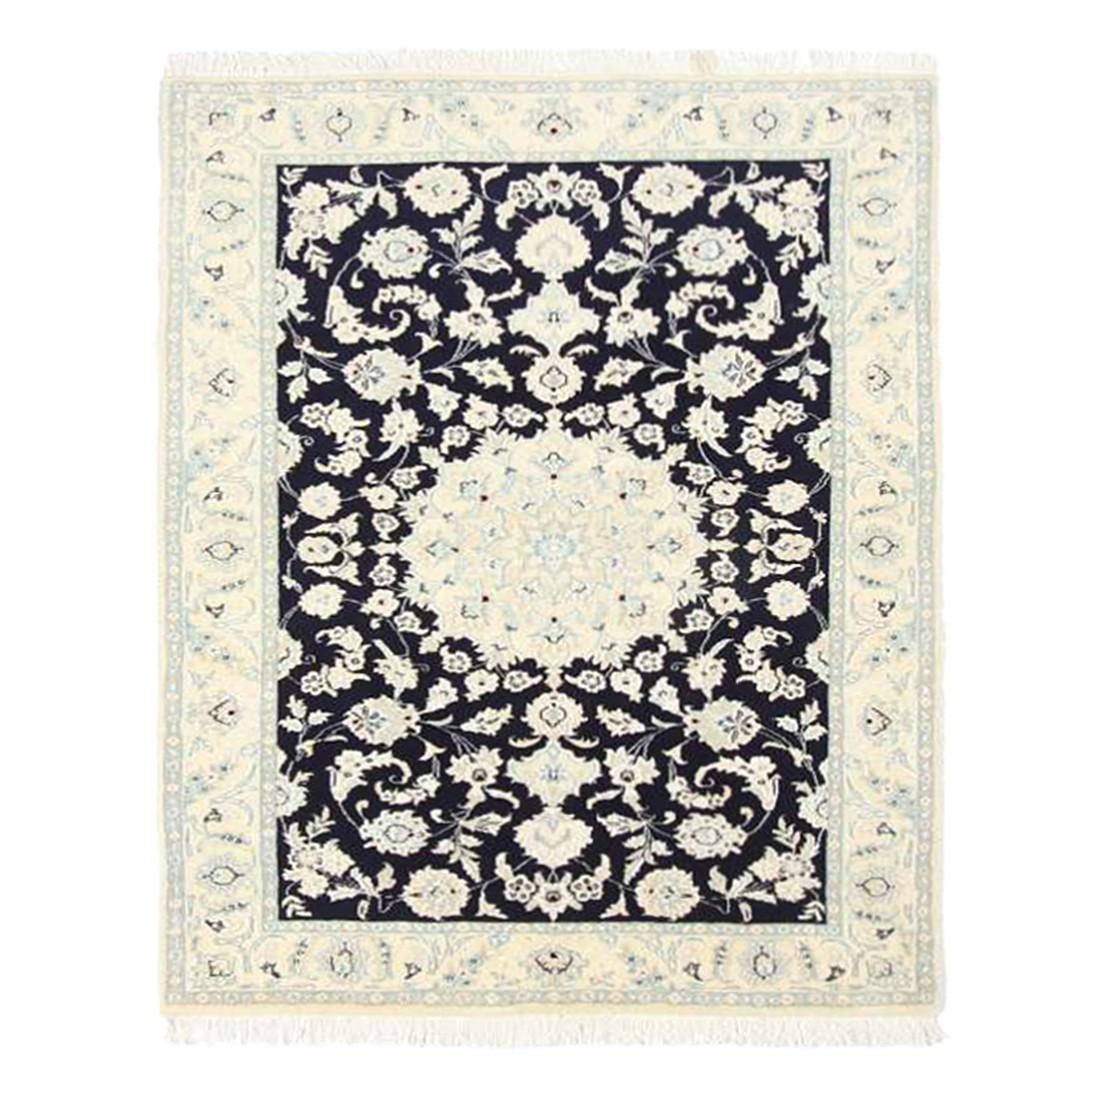 teppich nain scherkat royal blau 80 x 200 cm parwis bestellen. Black Bedroom Furniture Sets. Home Design Ideas